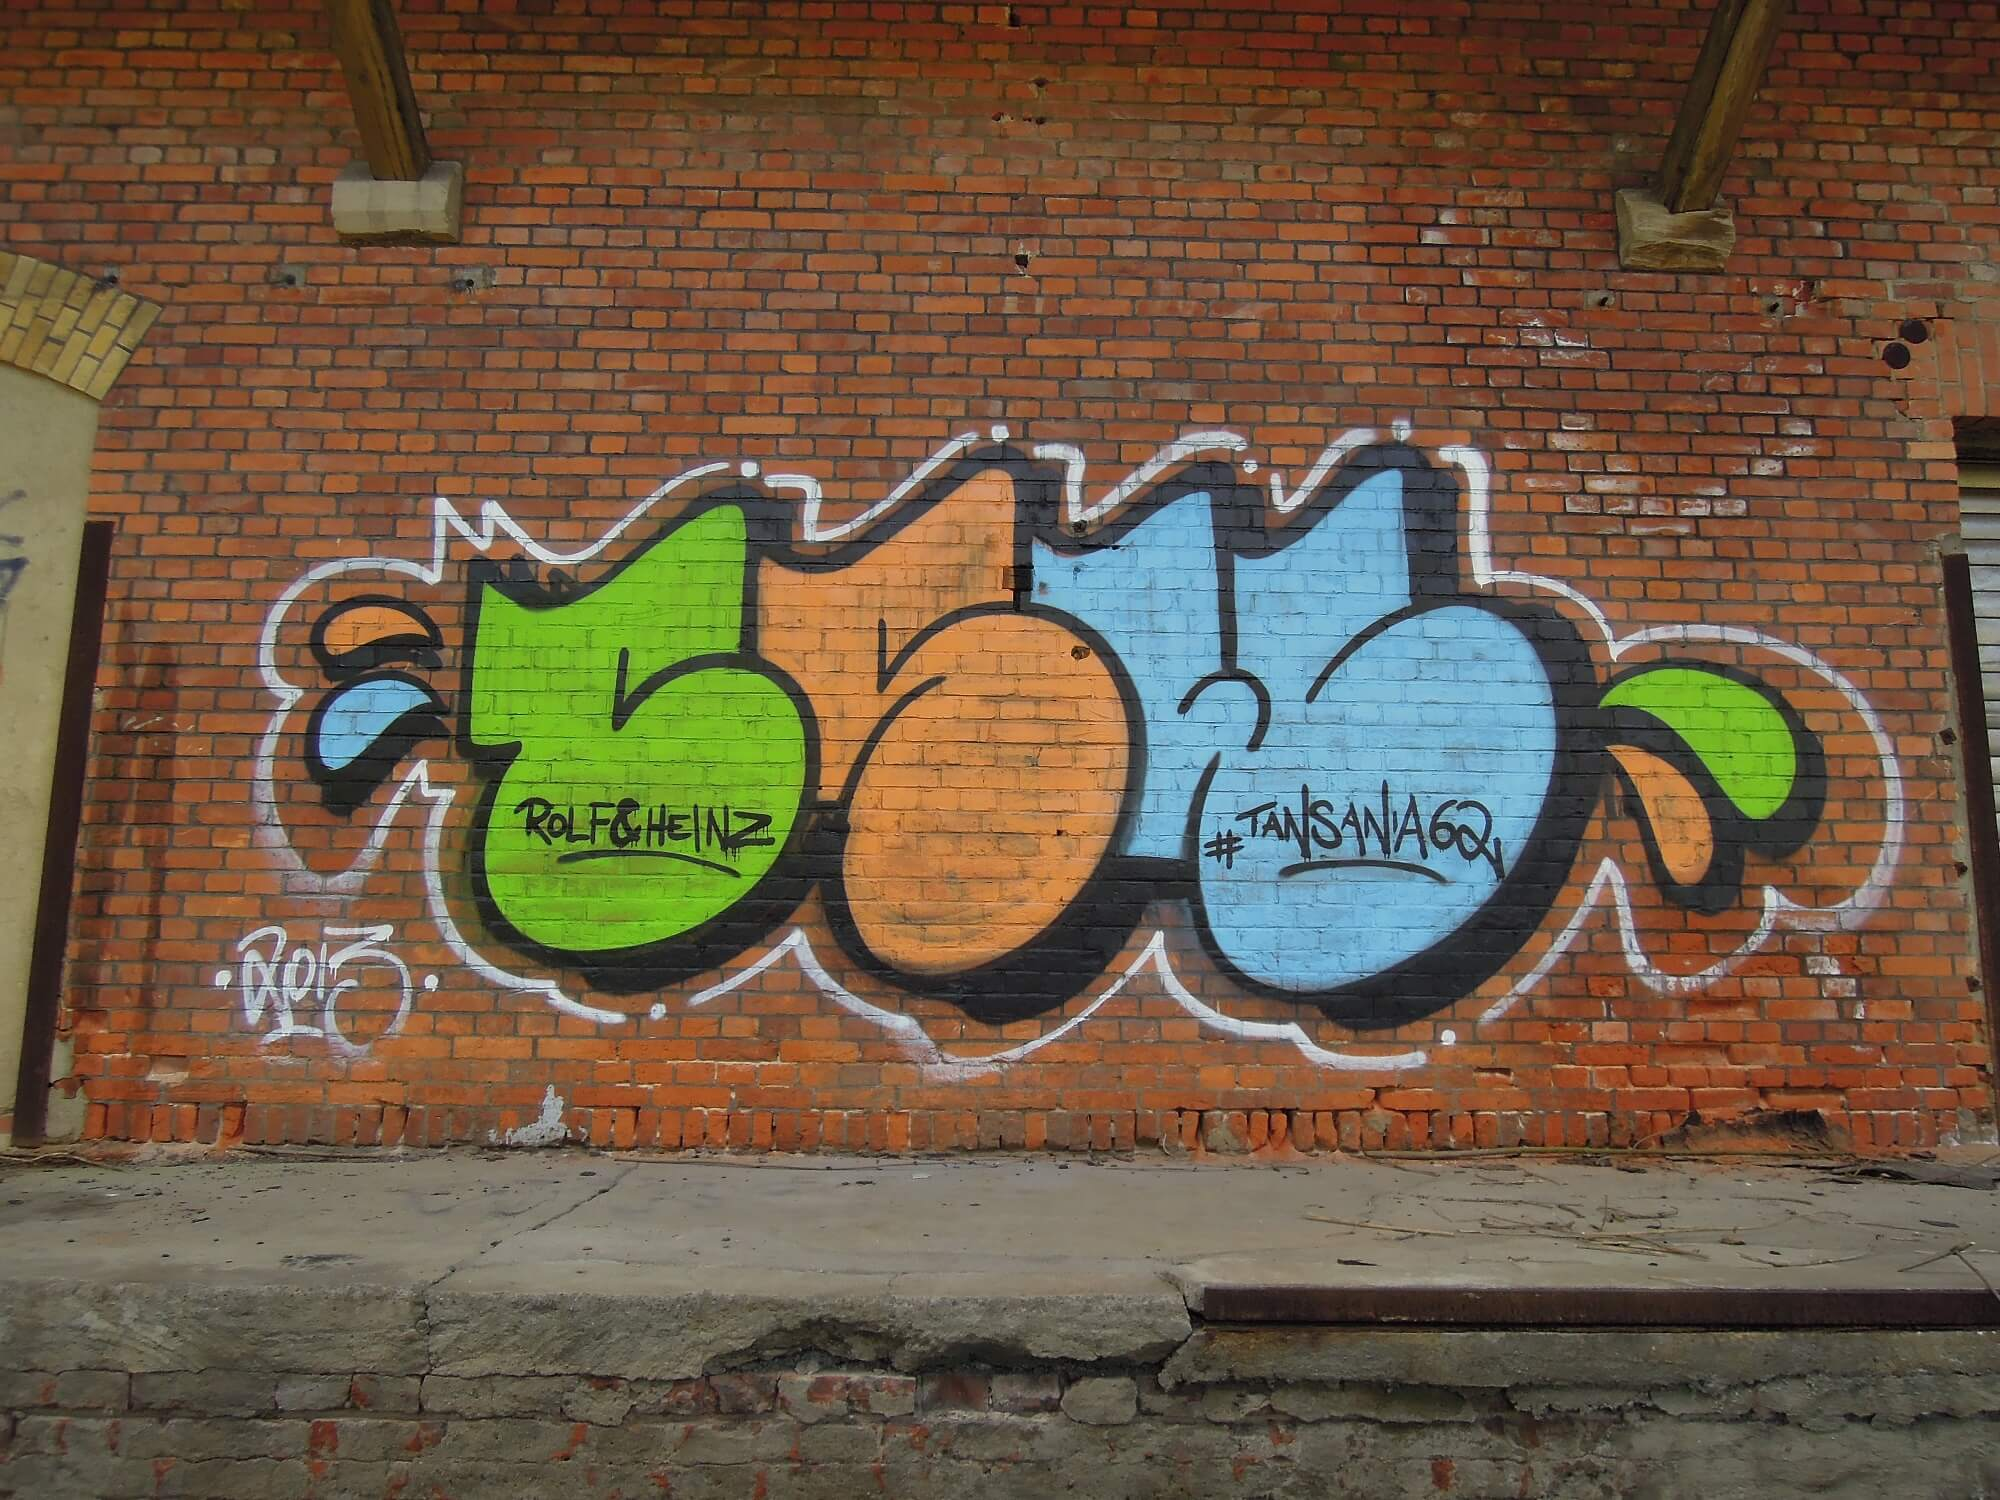 Güterbahnhof Coburg. CSW Piece 2. Kunst und so - Grüß dich mei Guder. Street Art. Graffiti Coburg. JDE TDN CSW GDMG!